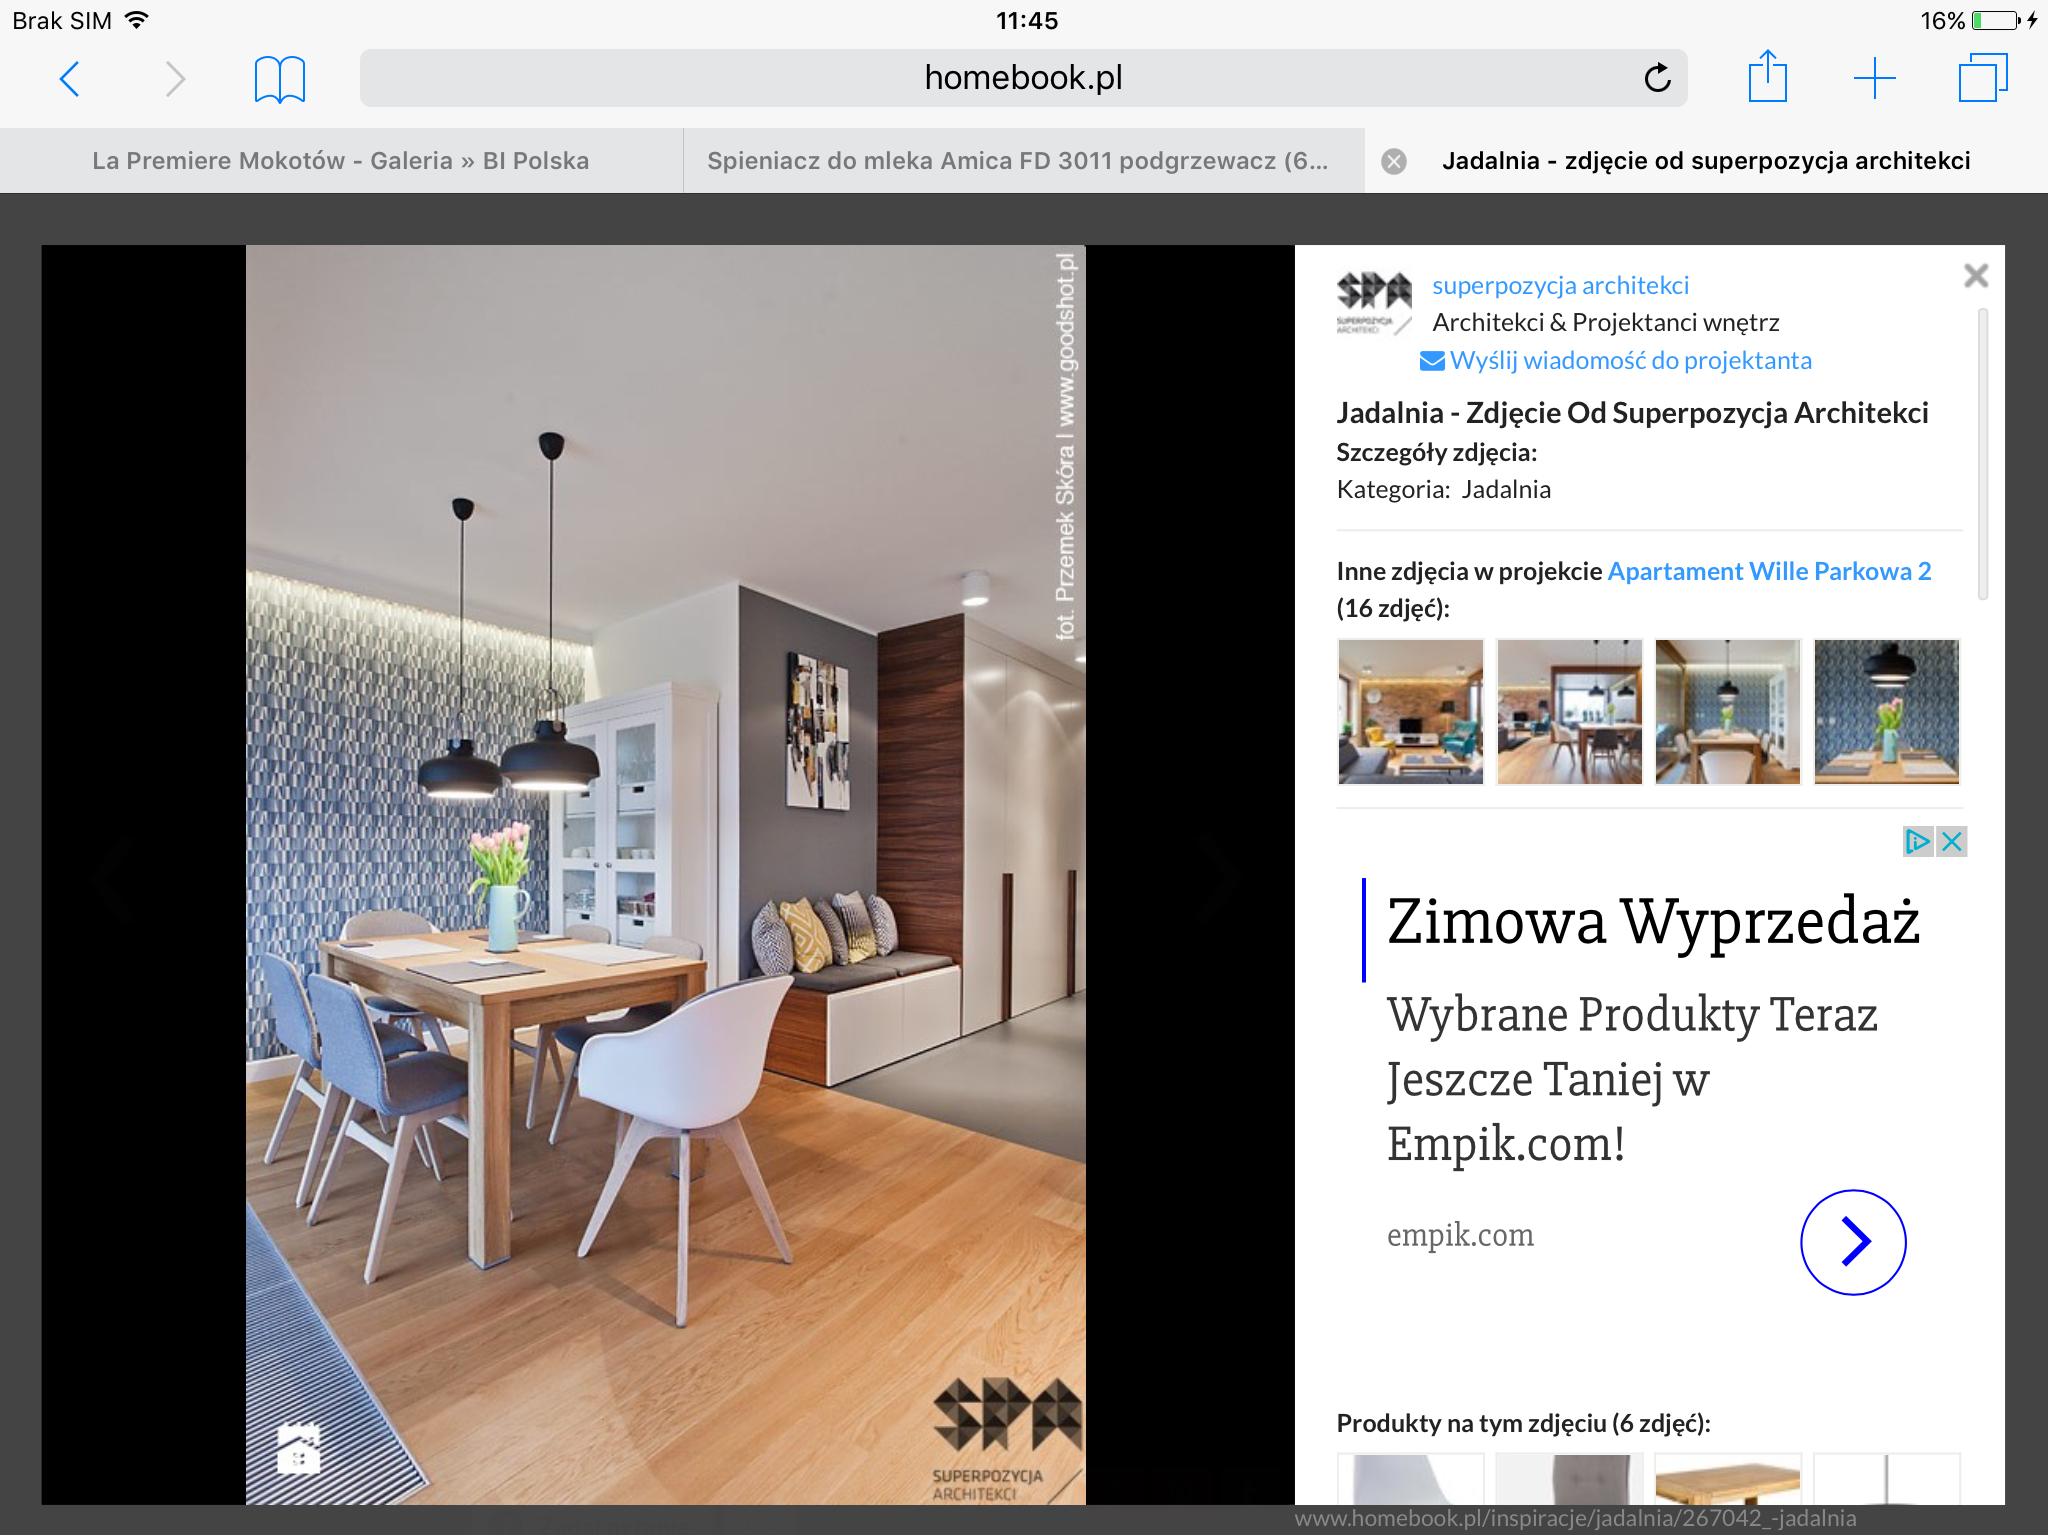 Pin By Emilia Kalinowska On Mieszkanie Desktop Desktop Screenshot Screenshots